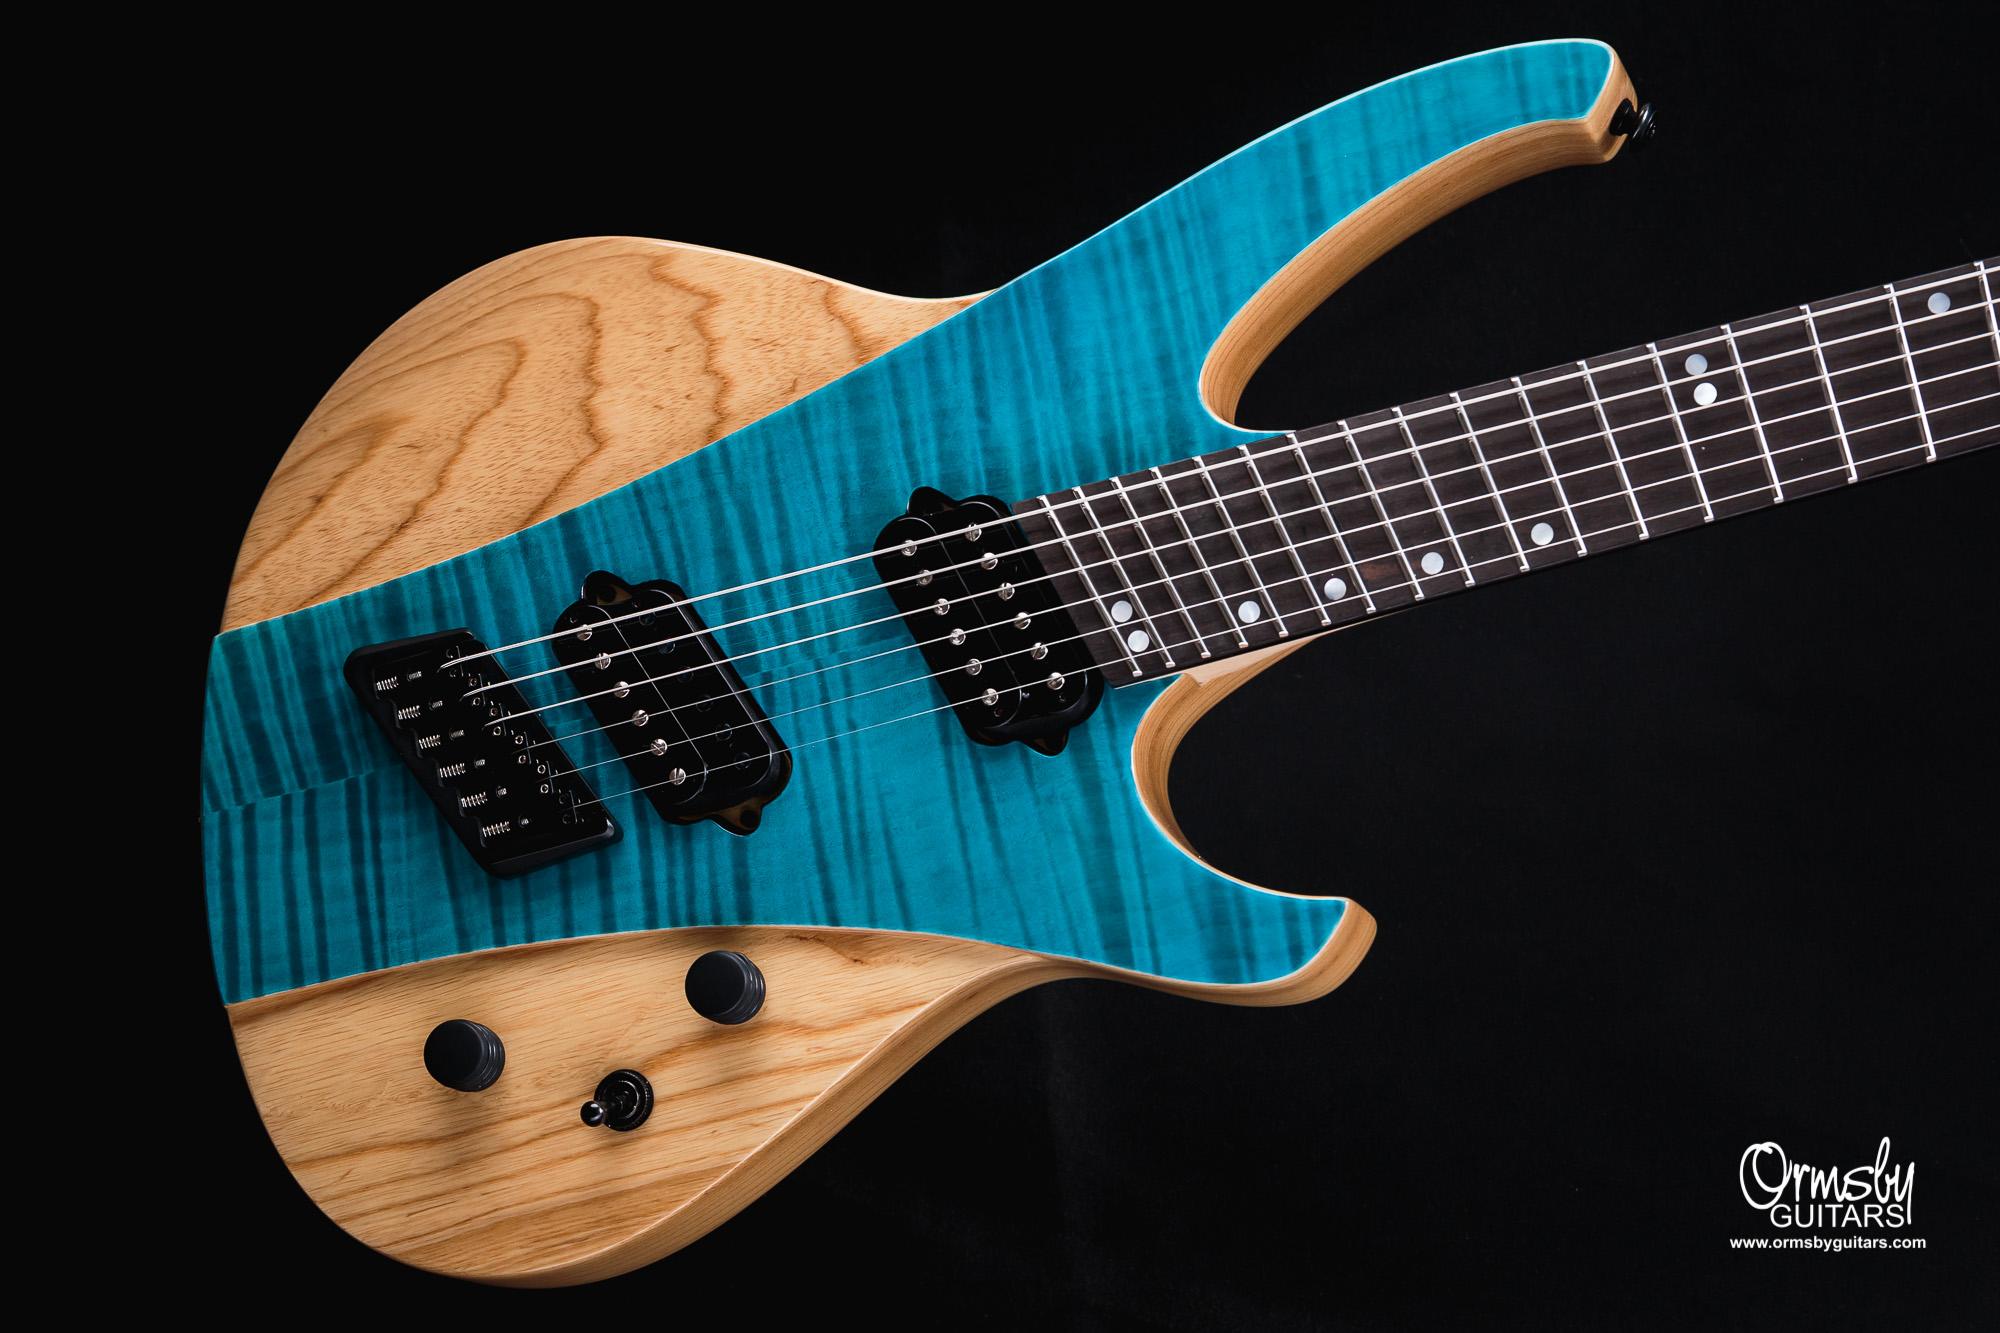 Ormsby Guitars Futura GTR